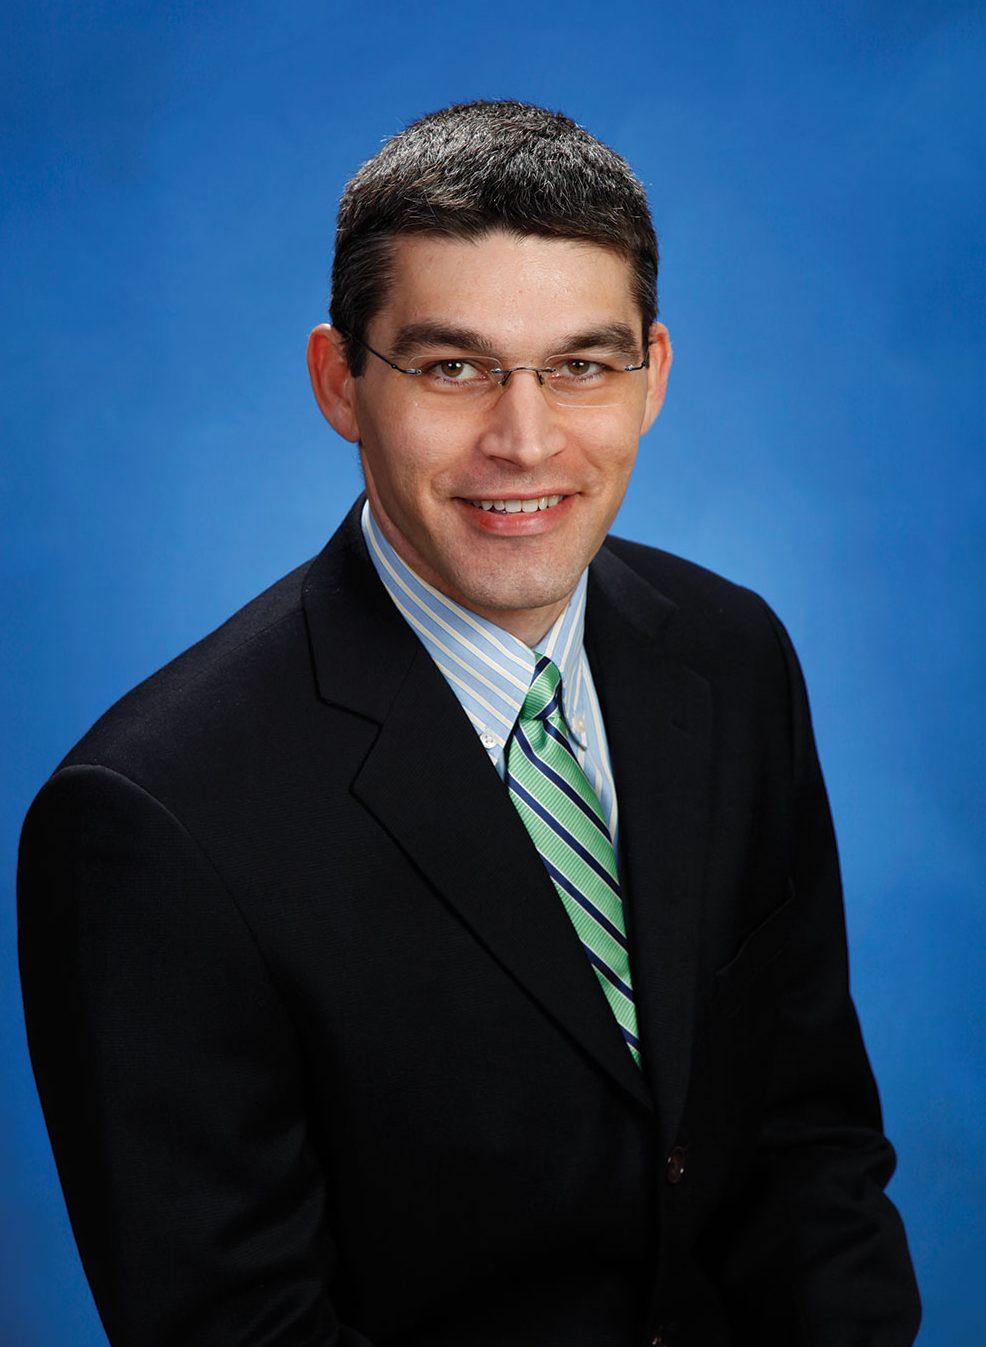 Alan R. Barnette, MD, FAAP